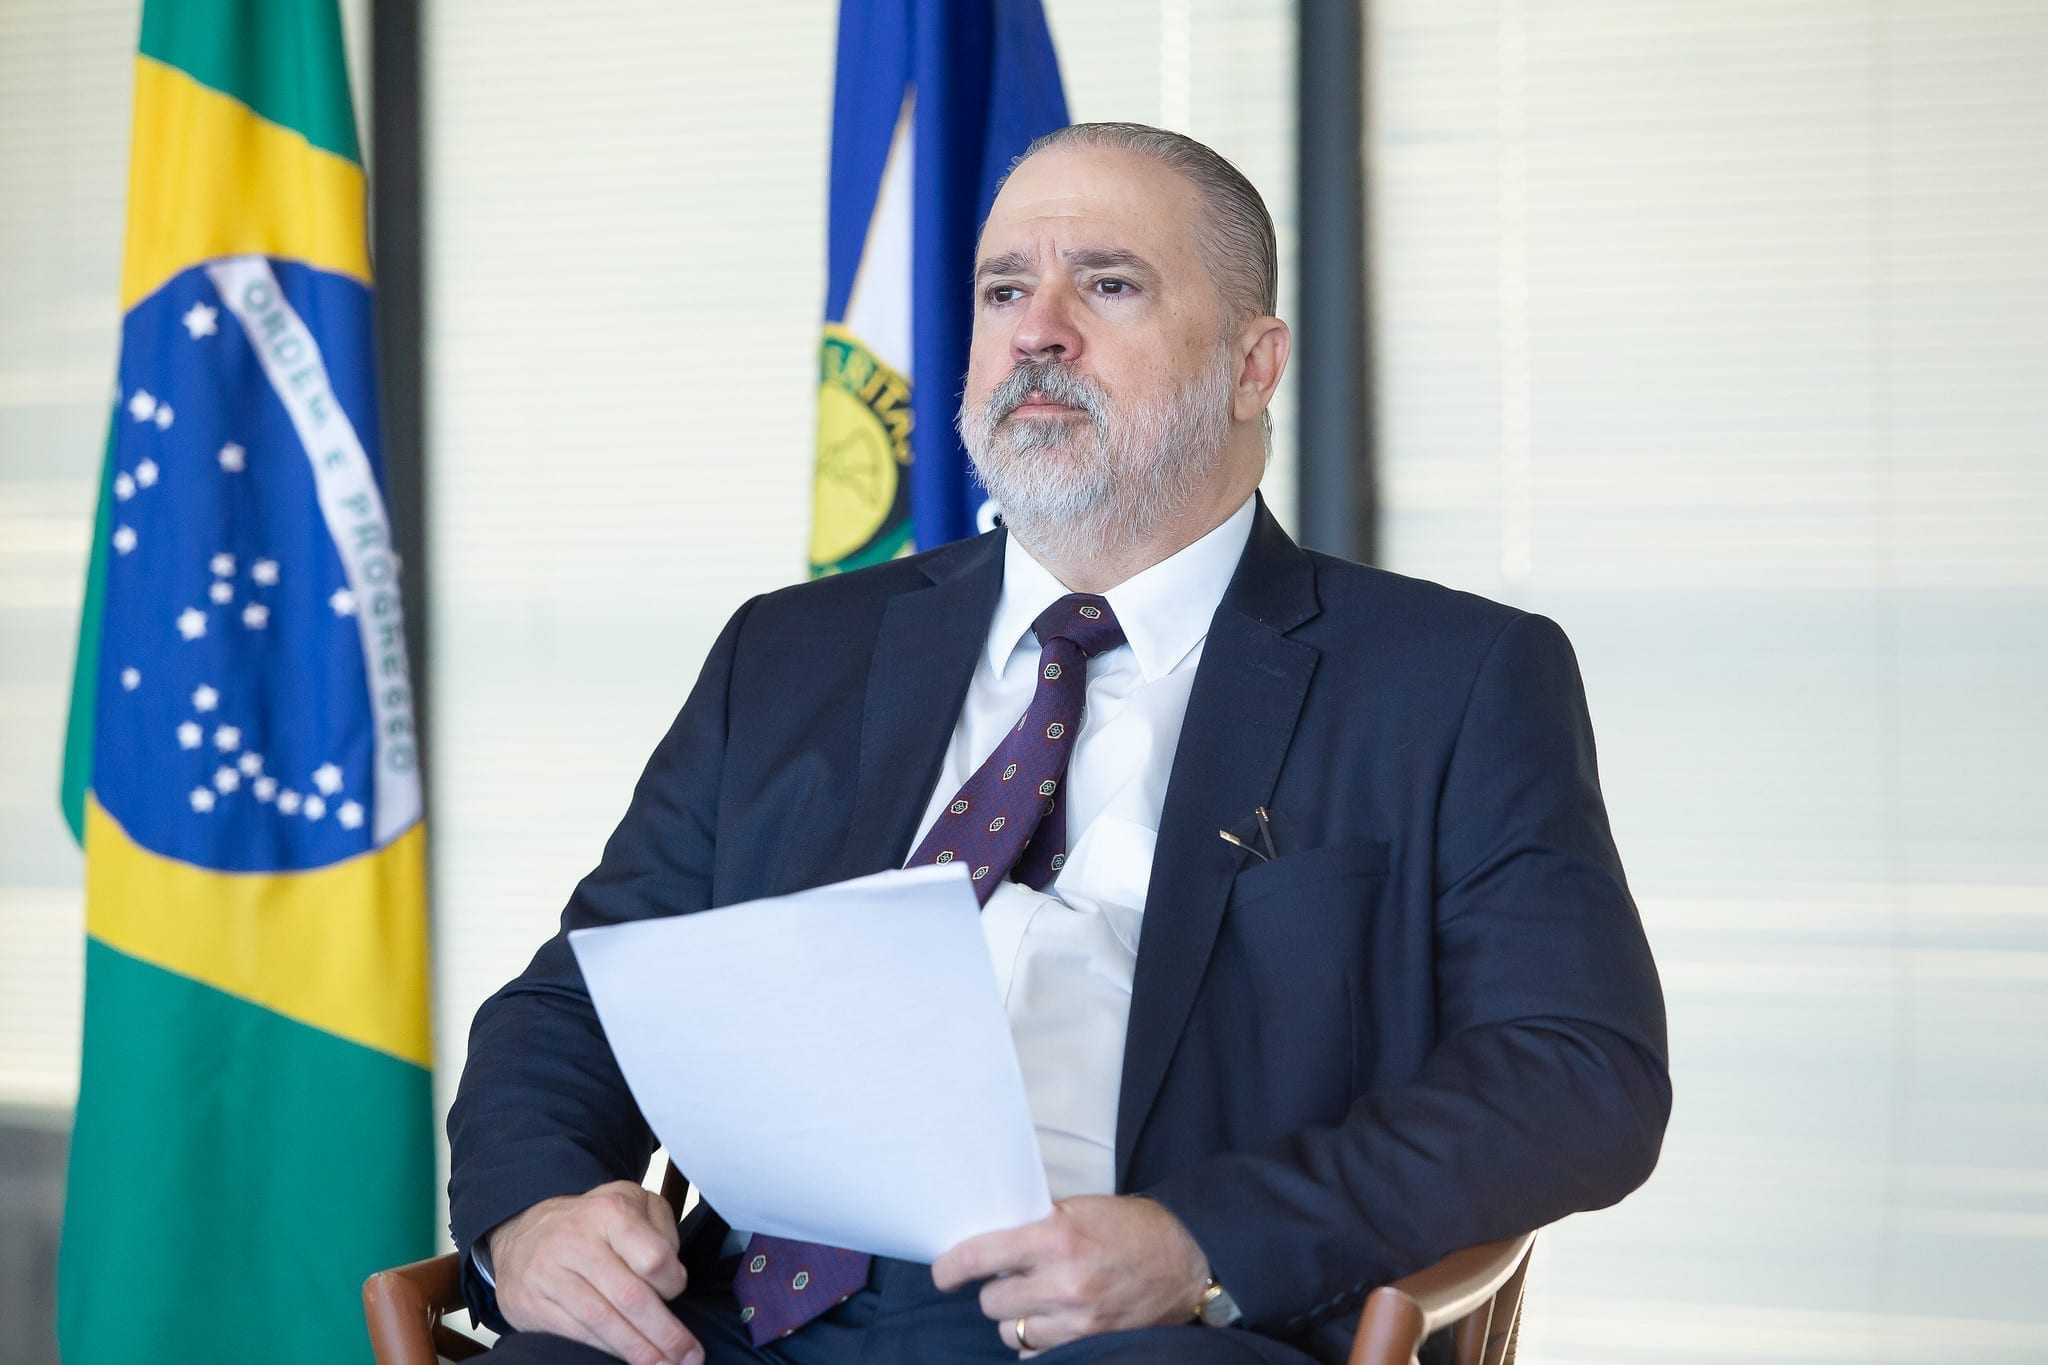 Conrado Hubner Mendes